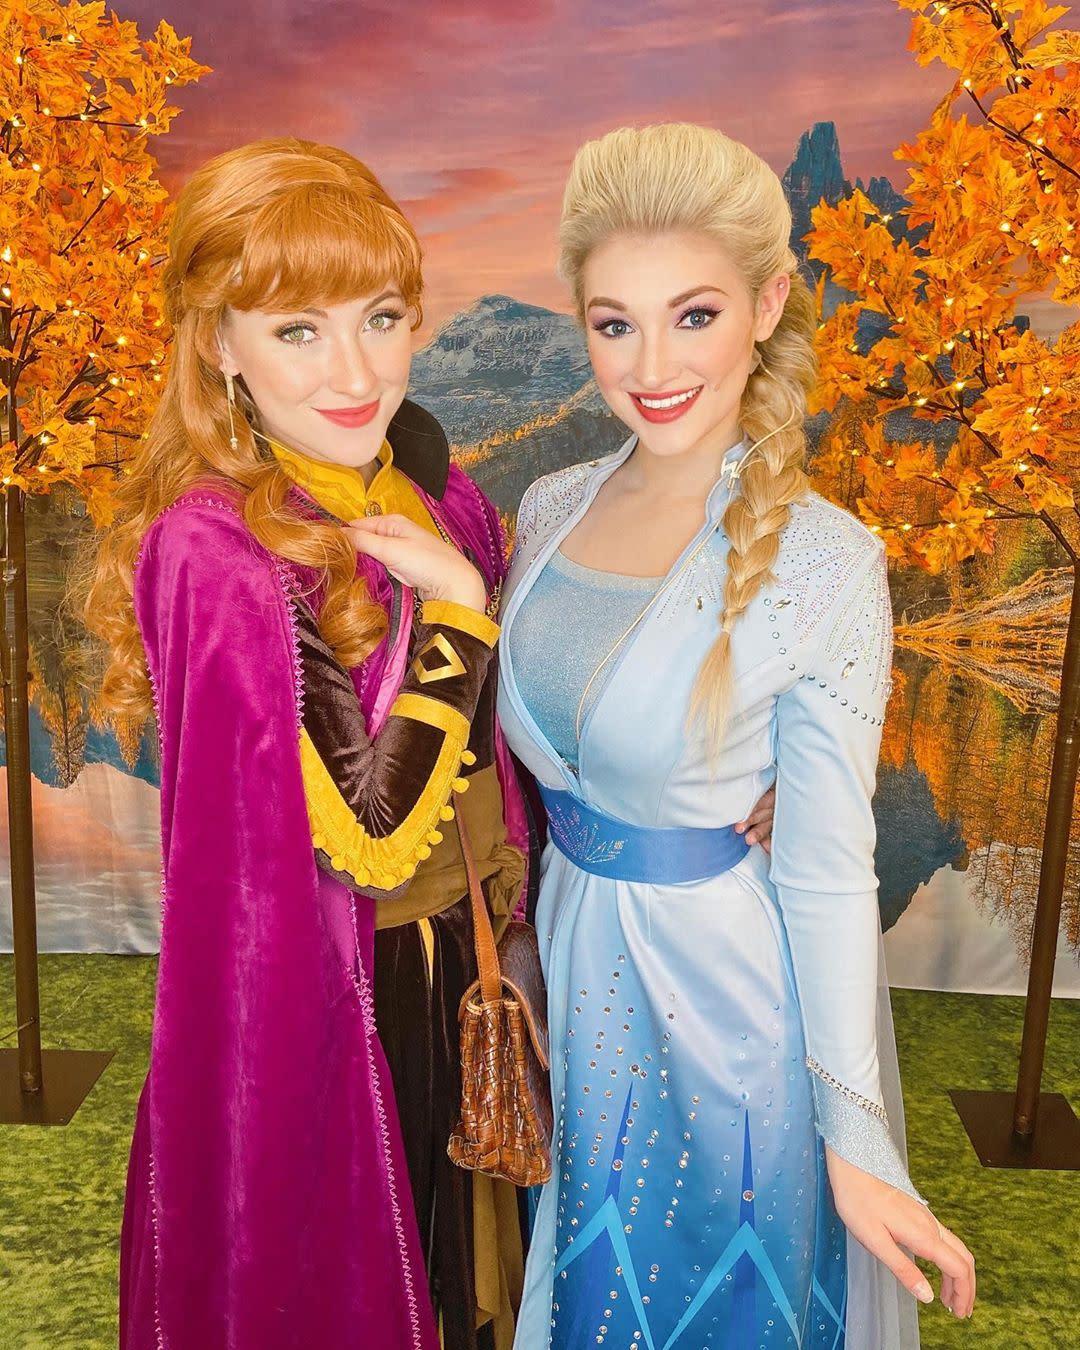 Losing gigs, actresses who play Disney Princesses turn to virtual entertainment during coronavirus pandemic